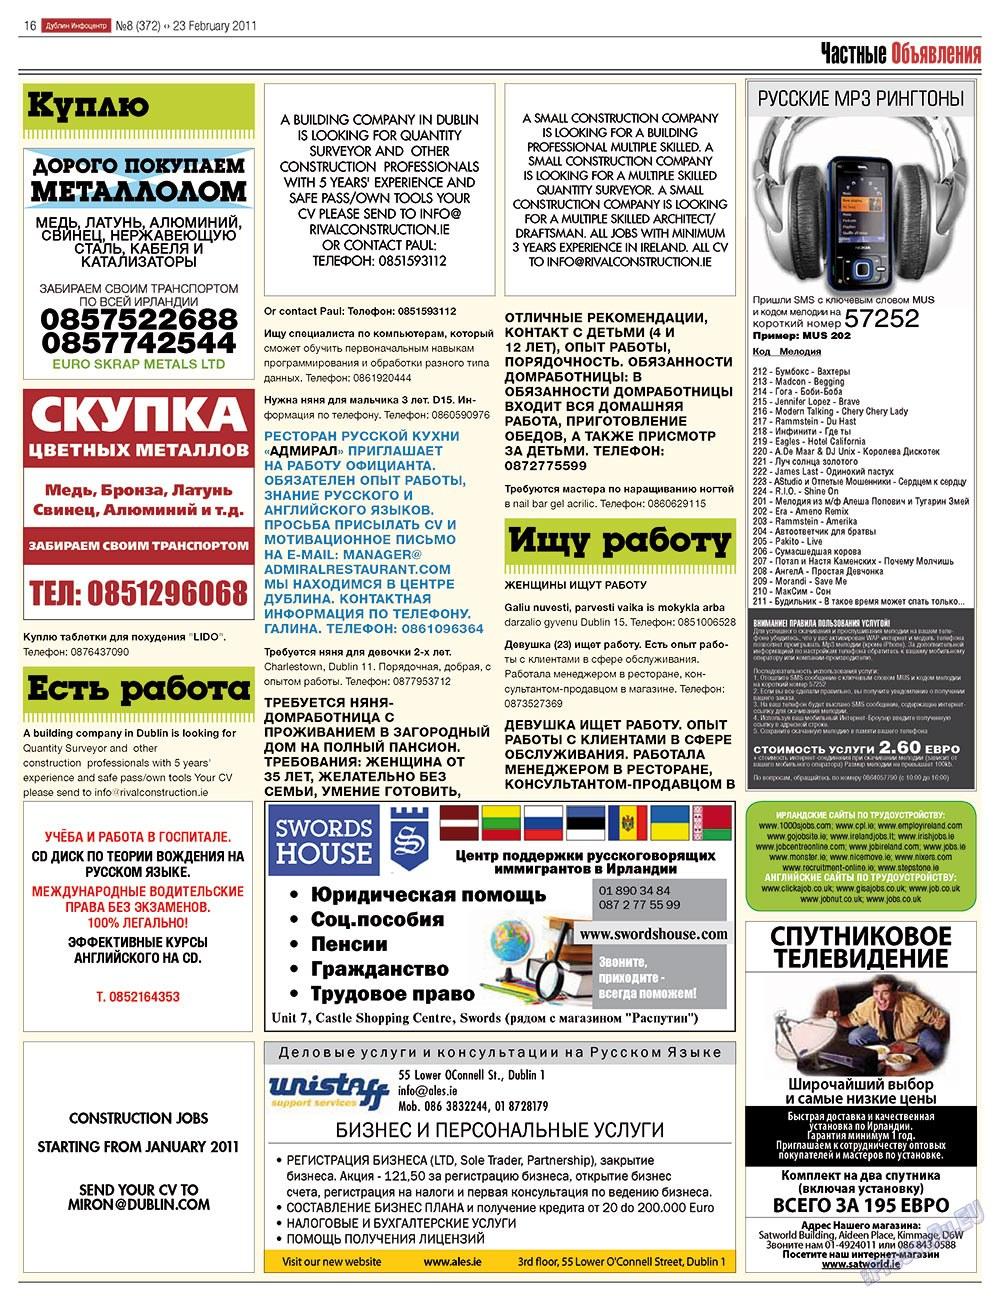 Дублин инфоцентр (газета). 2011 год, номер 8, стр. 16